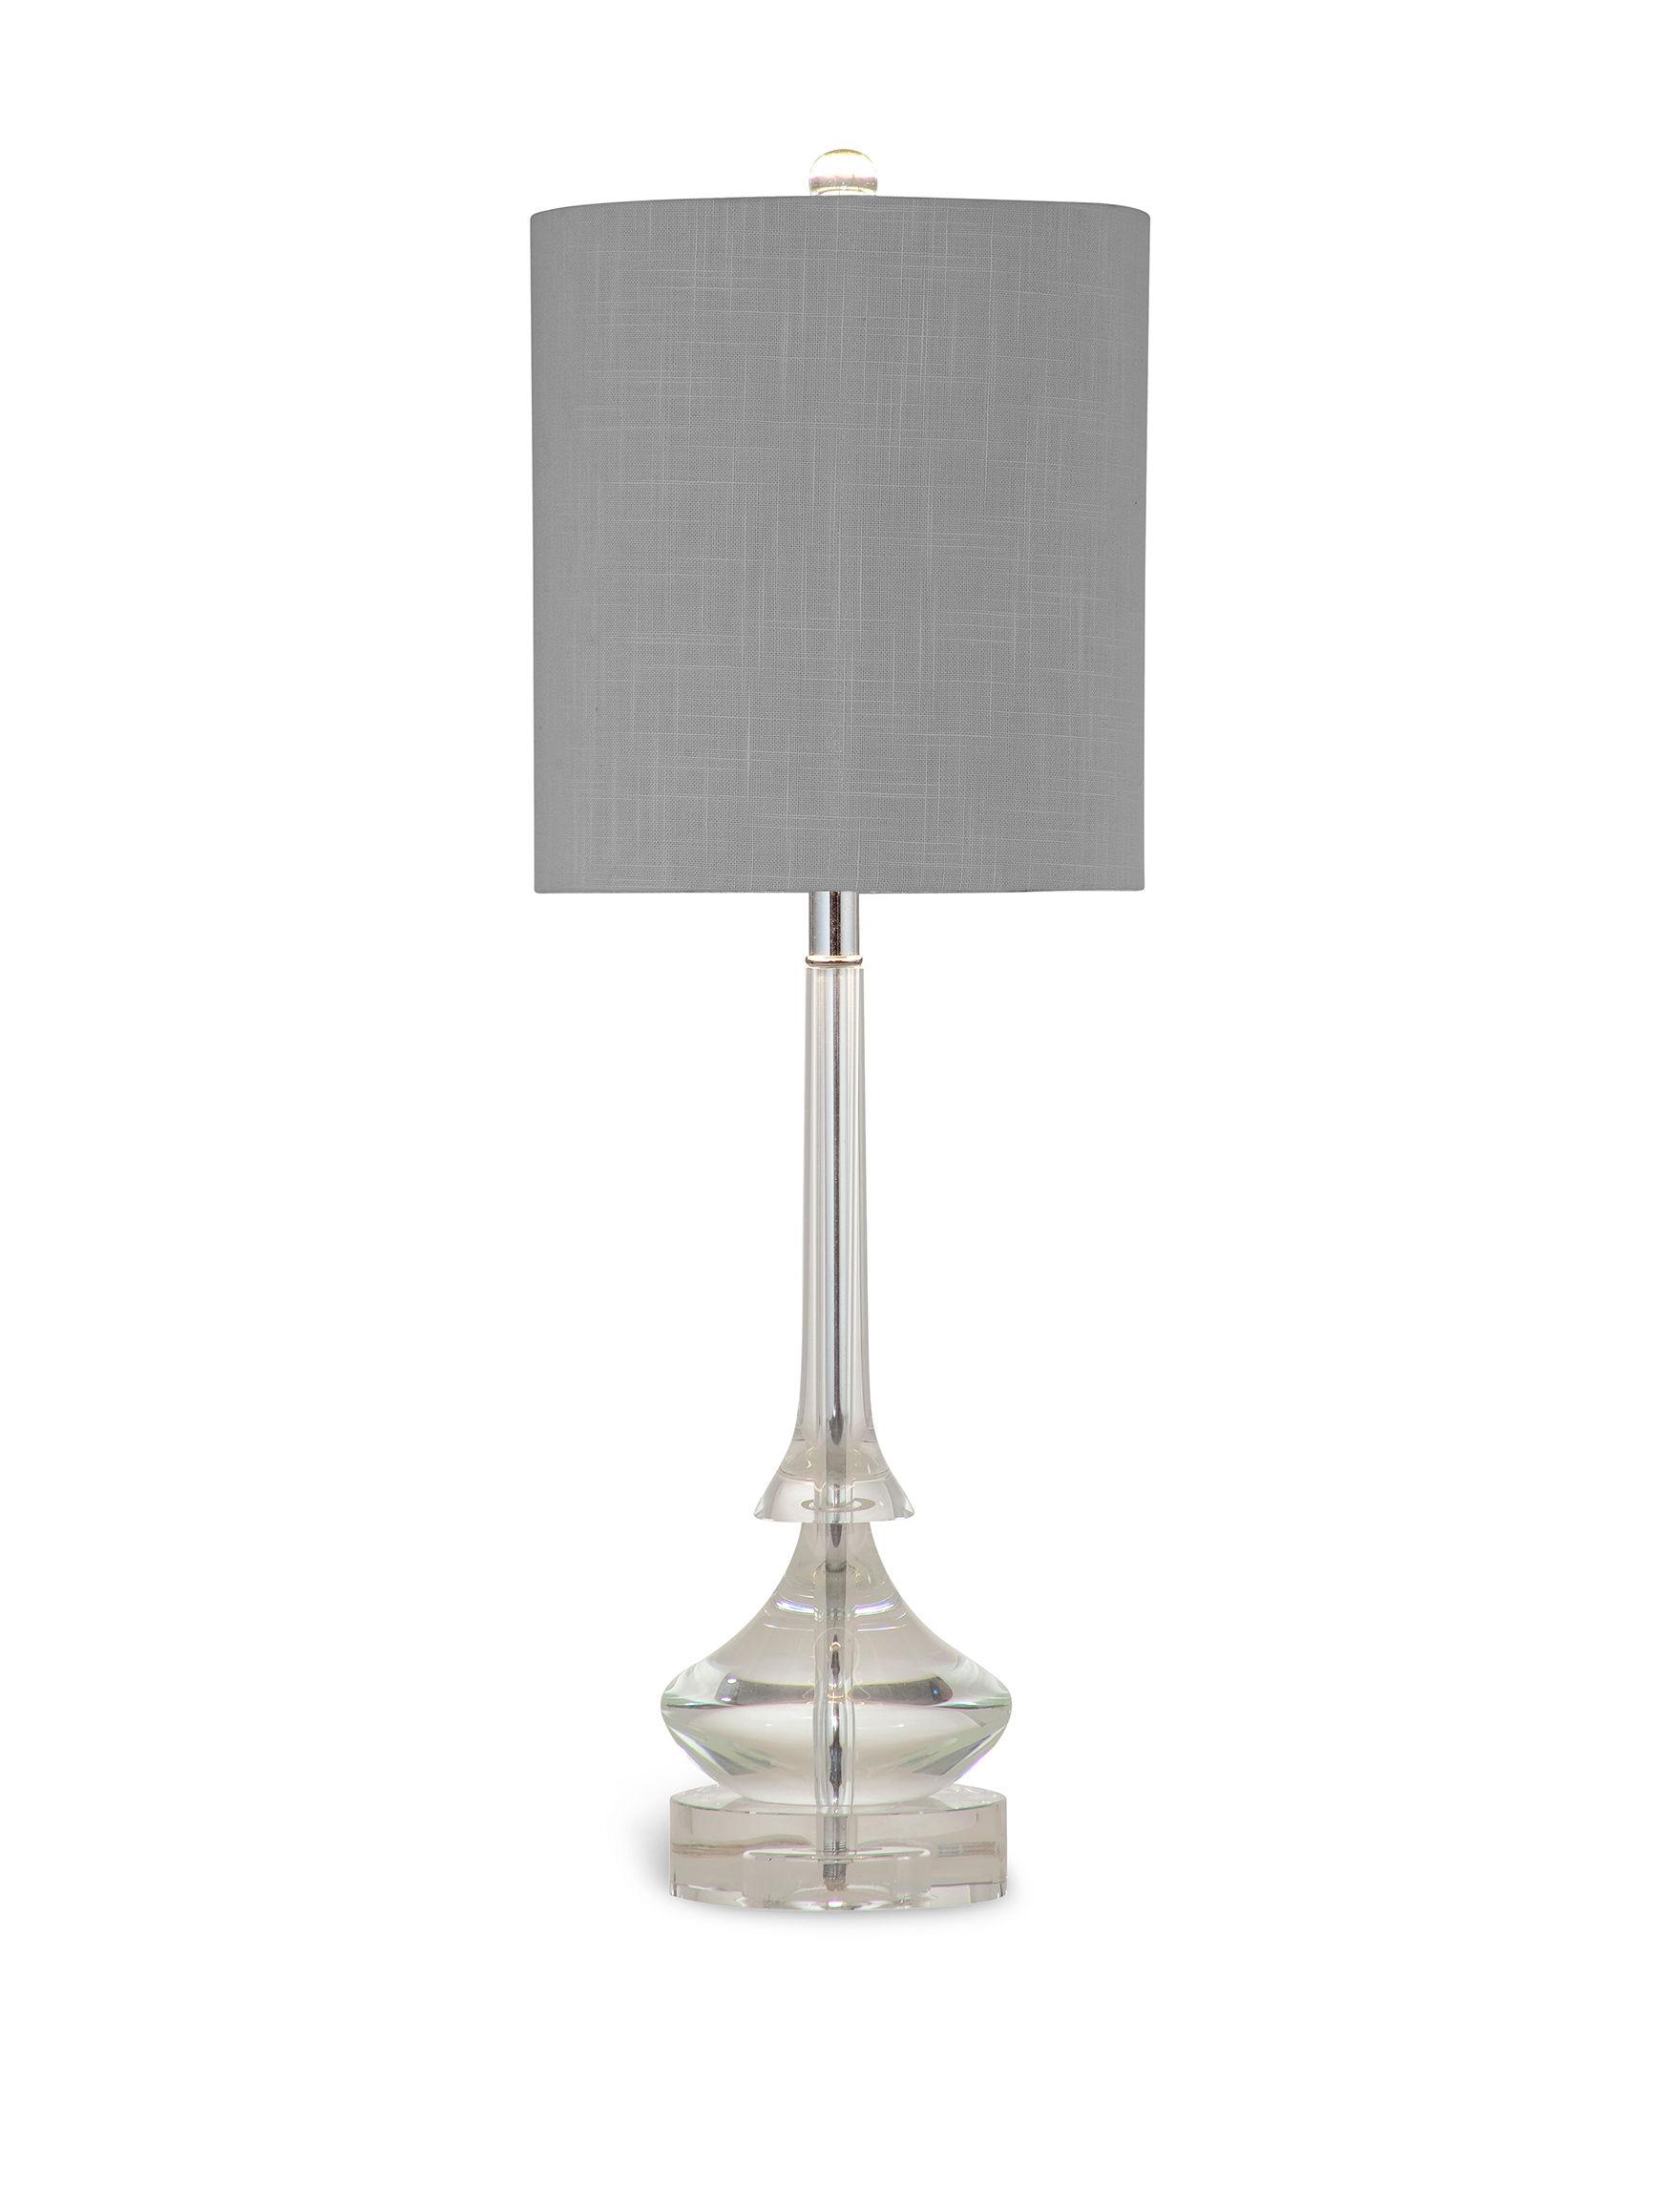 Bassett Mirror Co. Crystal Table Lamps Lighting & Lamps